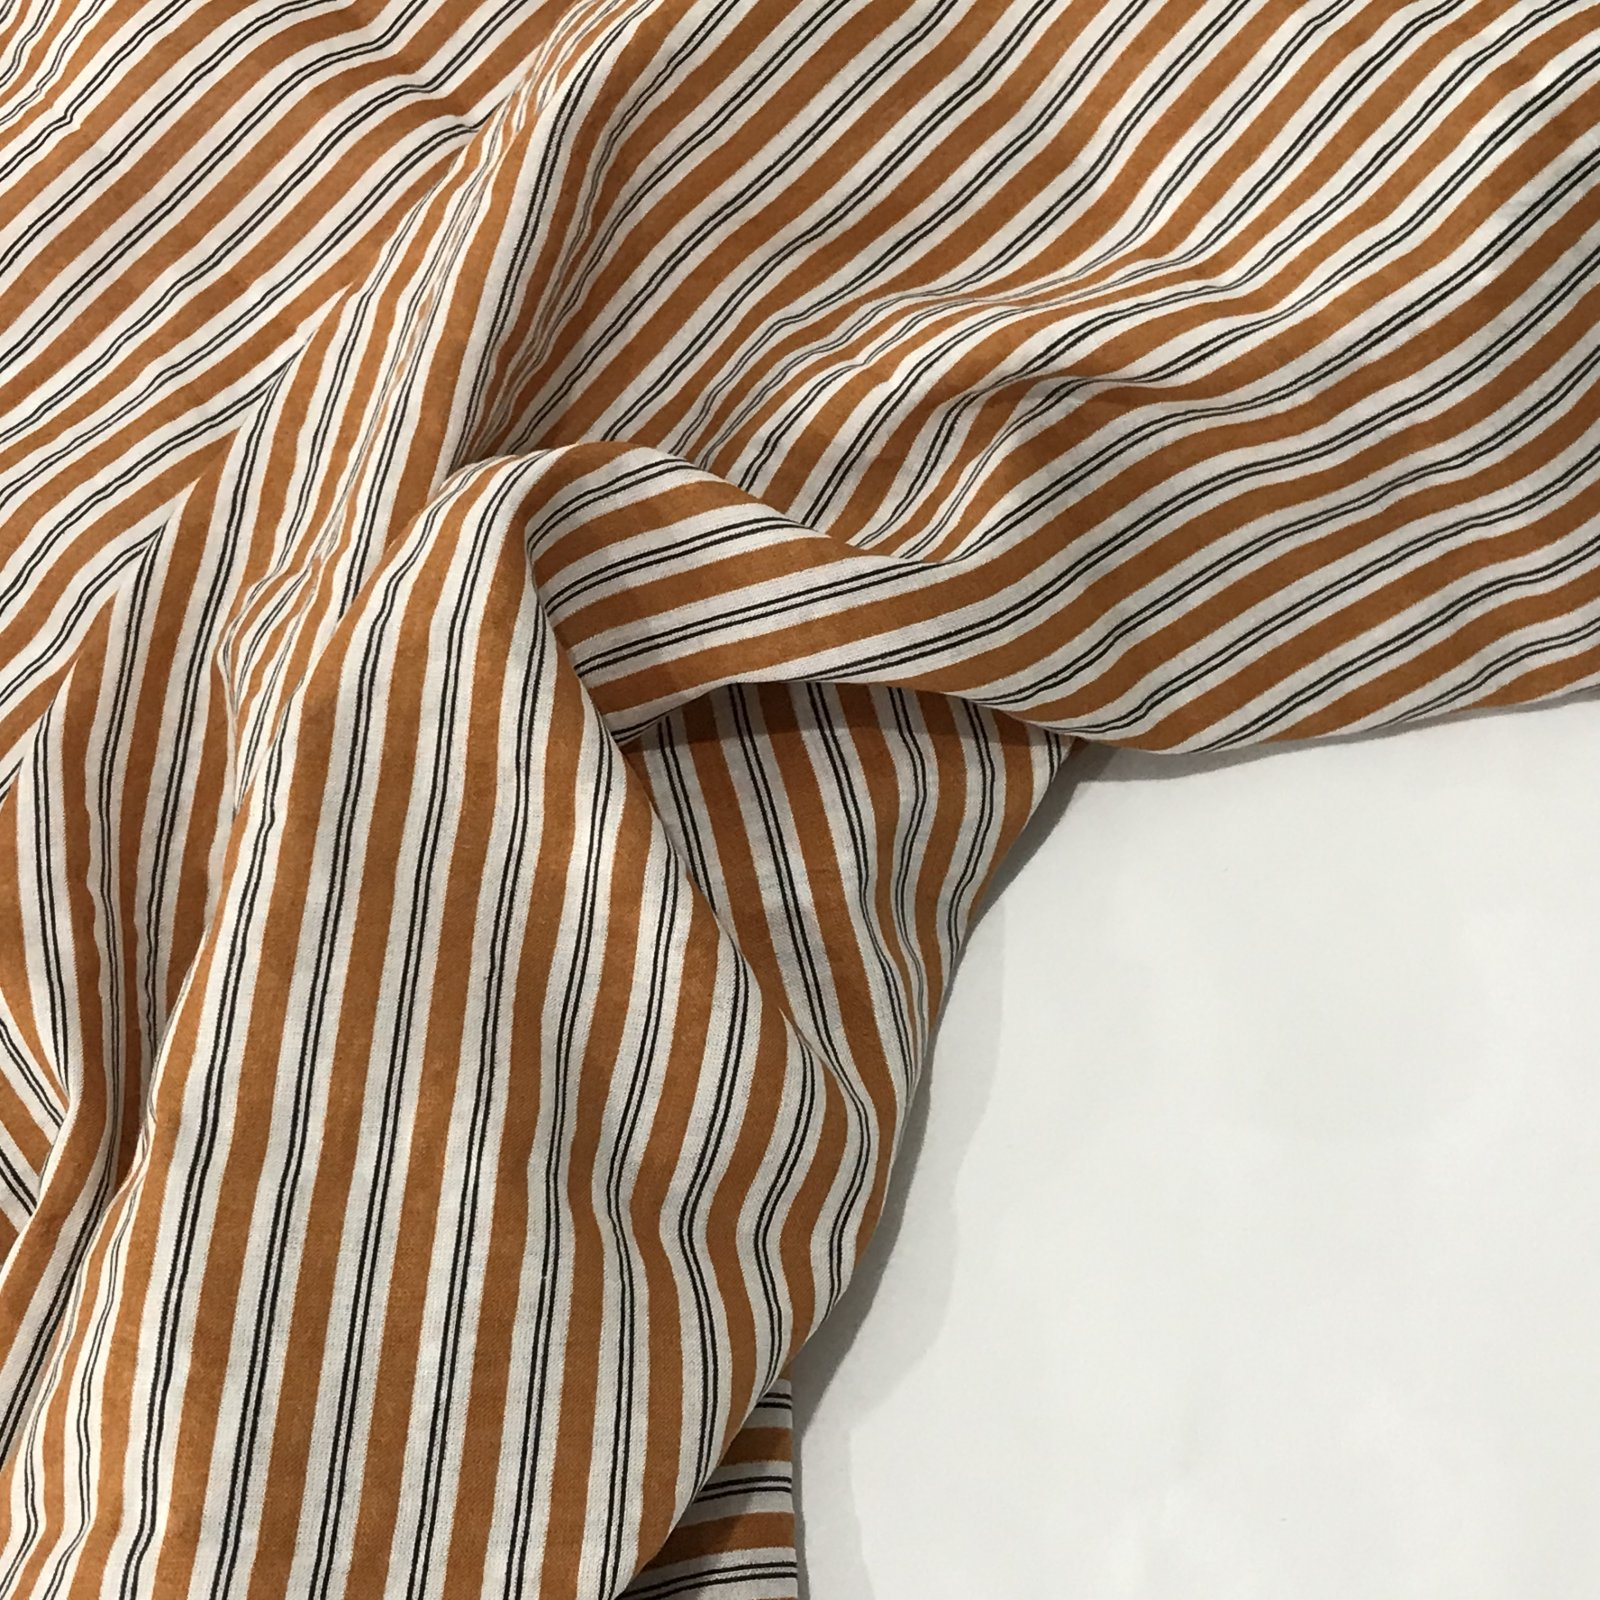 Verona Voile - Cinnamon and Black Stripes